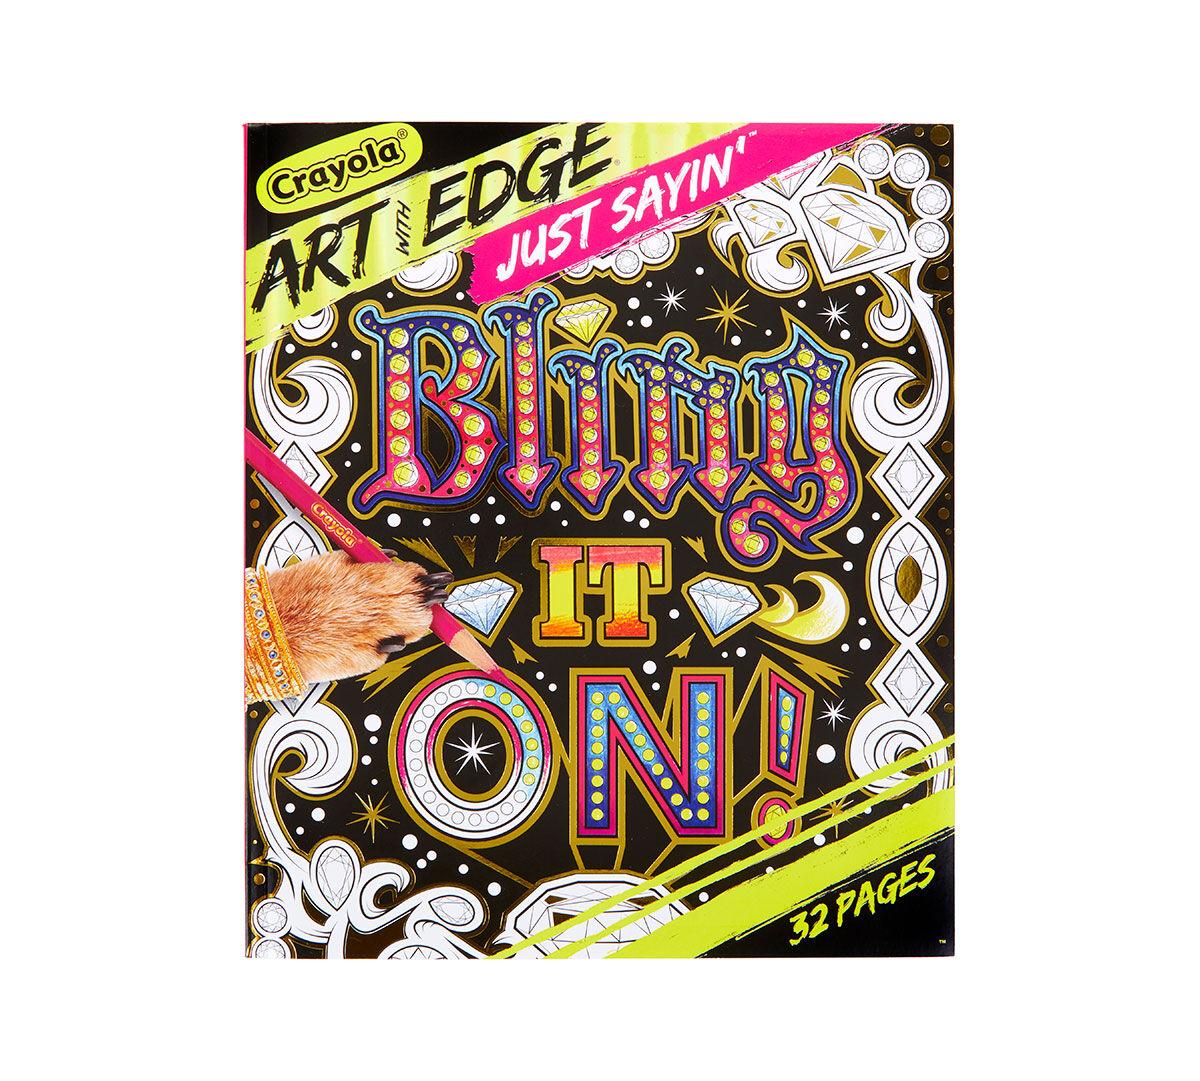 Art With Edge Just Sayin' II, Adult Coloring Pages Crayola.com Crayola